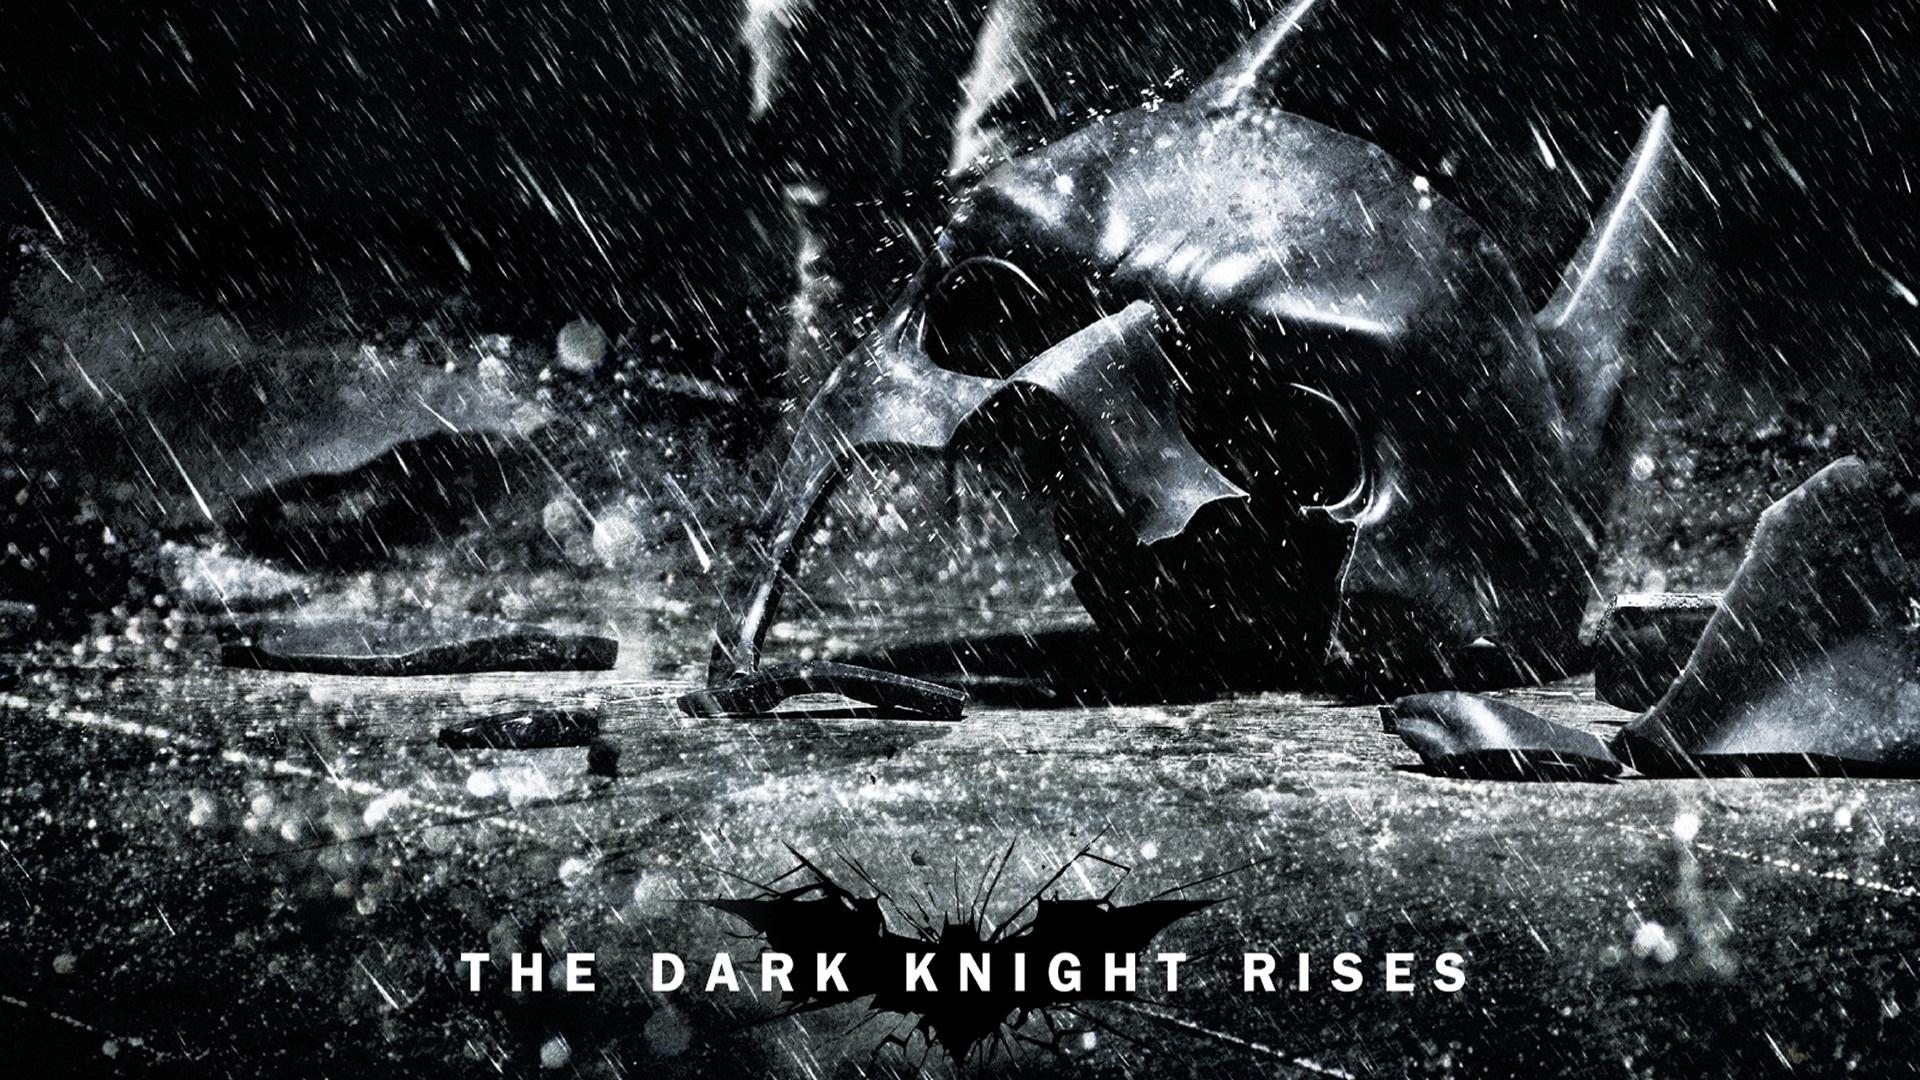 Rewriting The Dark Knight Rises